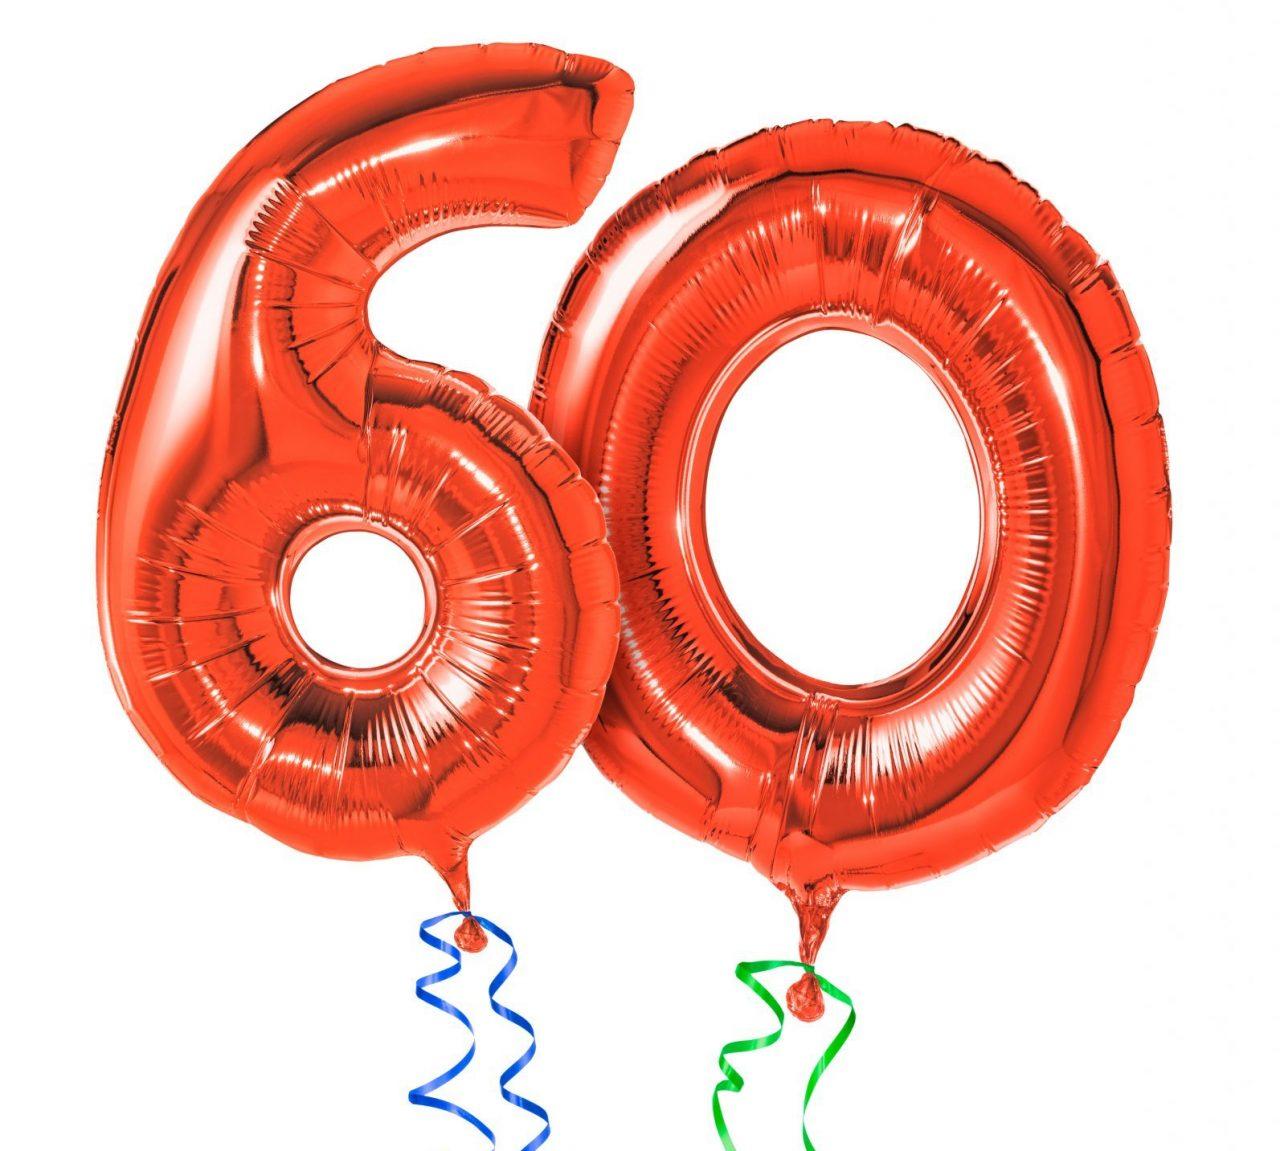 Celebrate British Heart Foundation's 60th Birthday